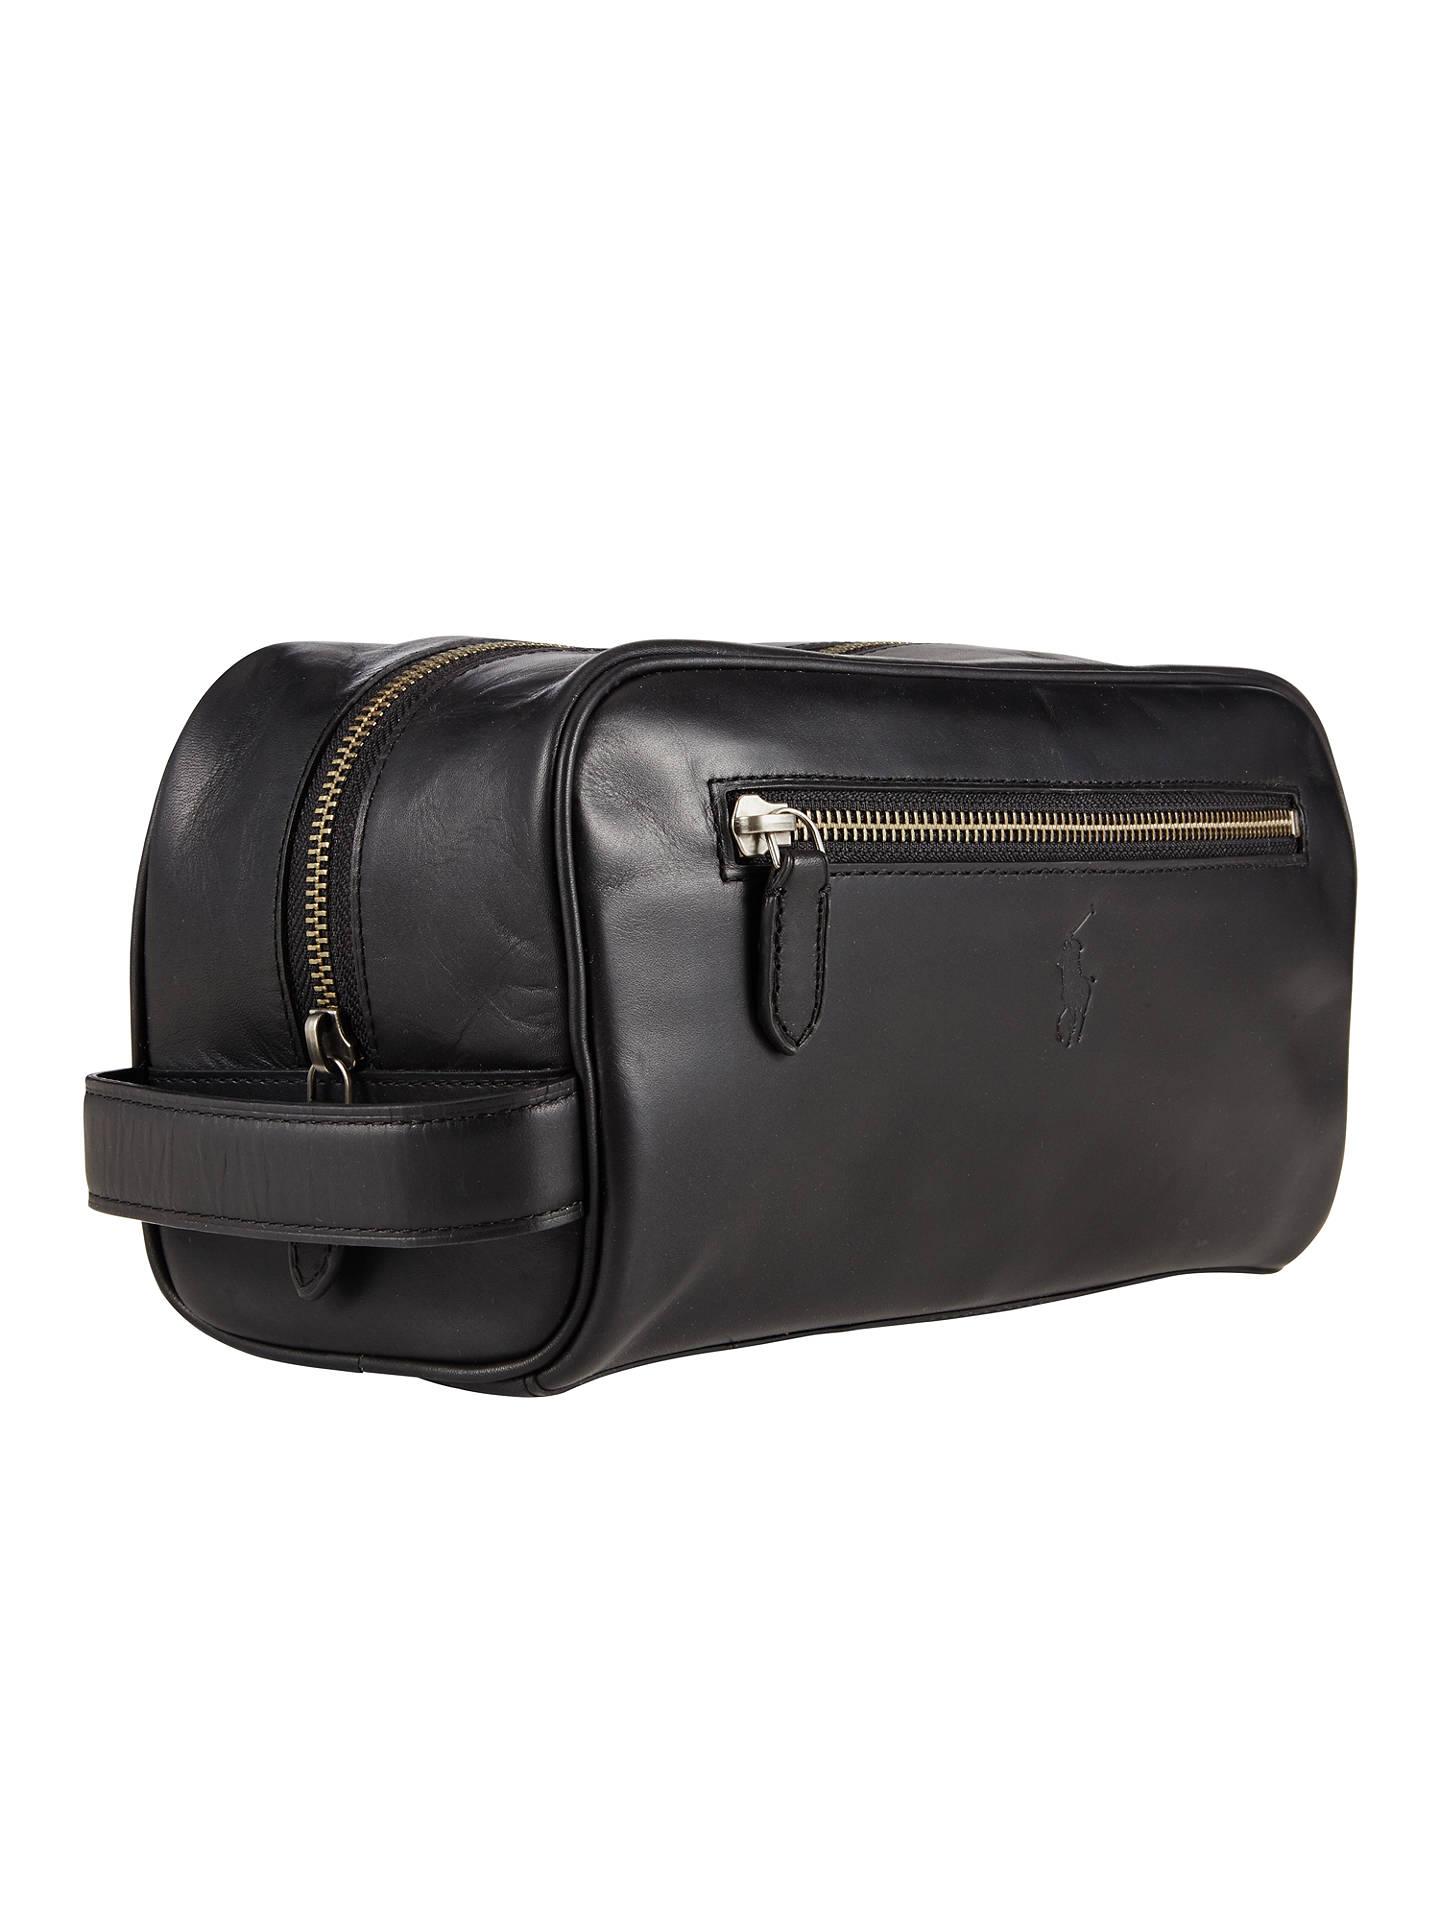 ... BuyPolo Ralph Lauren Leather Shaving Kit 2ea6b5e07dc17